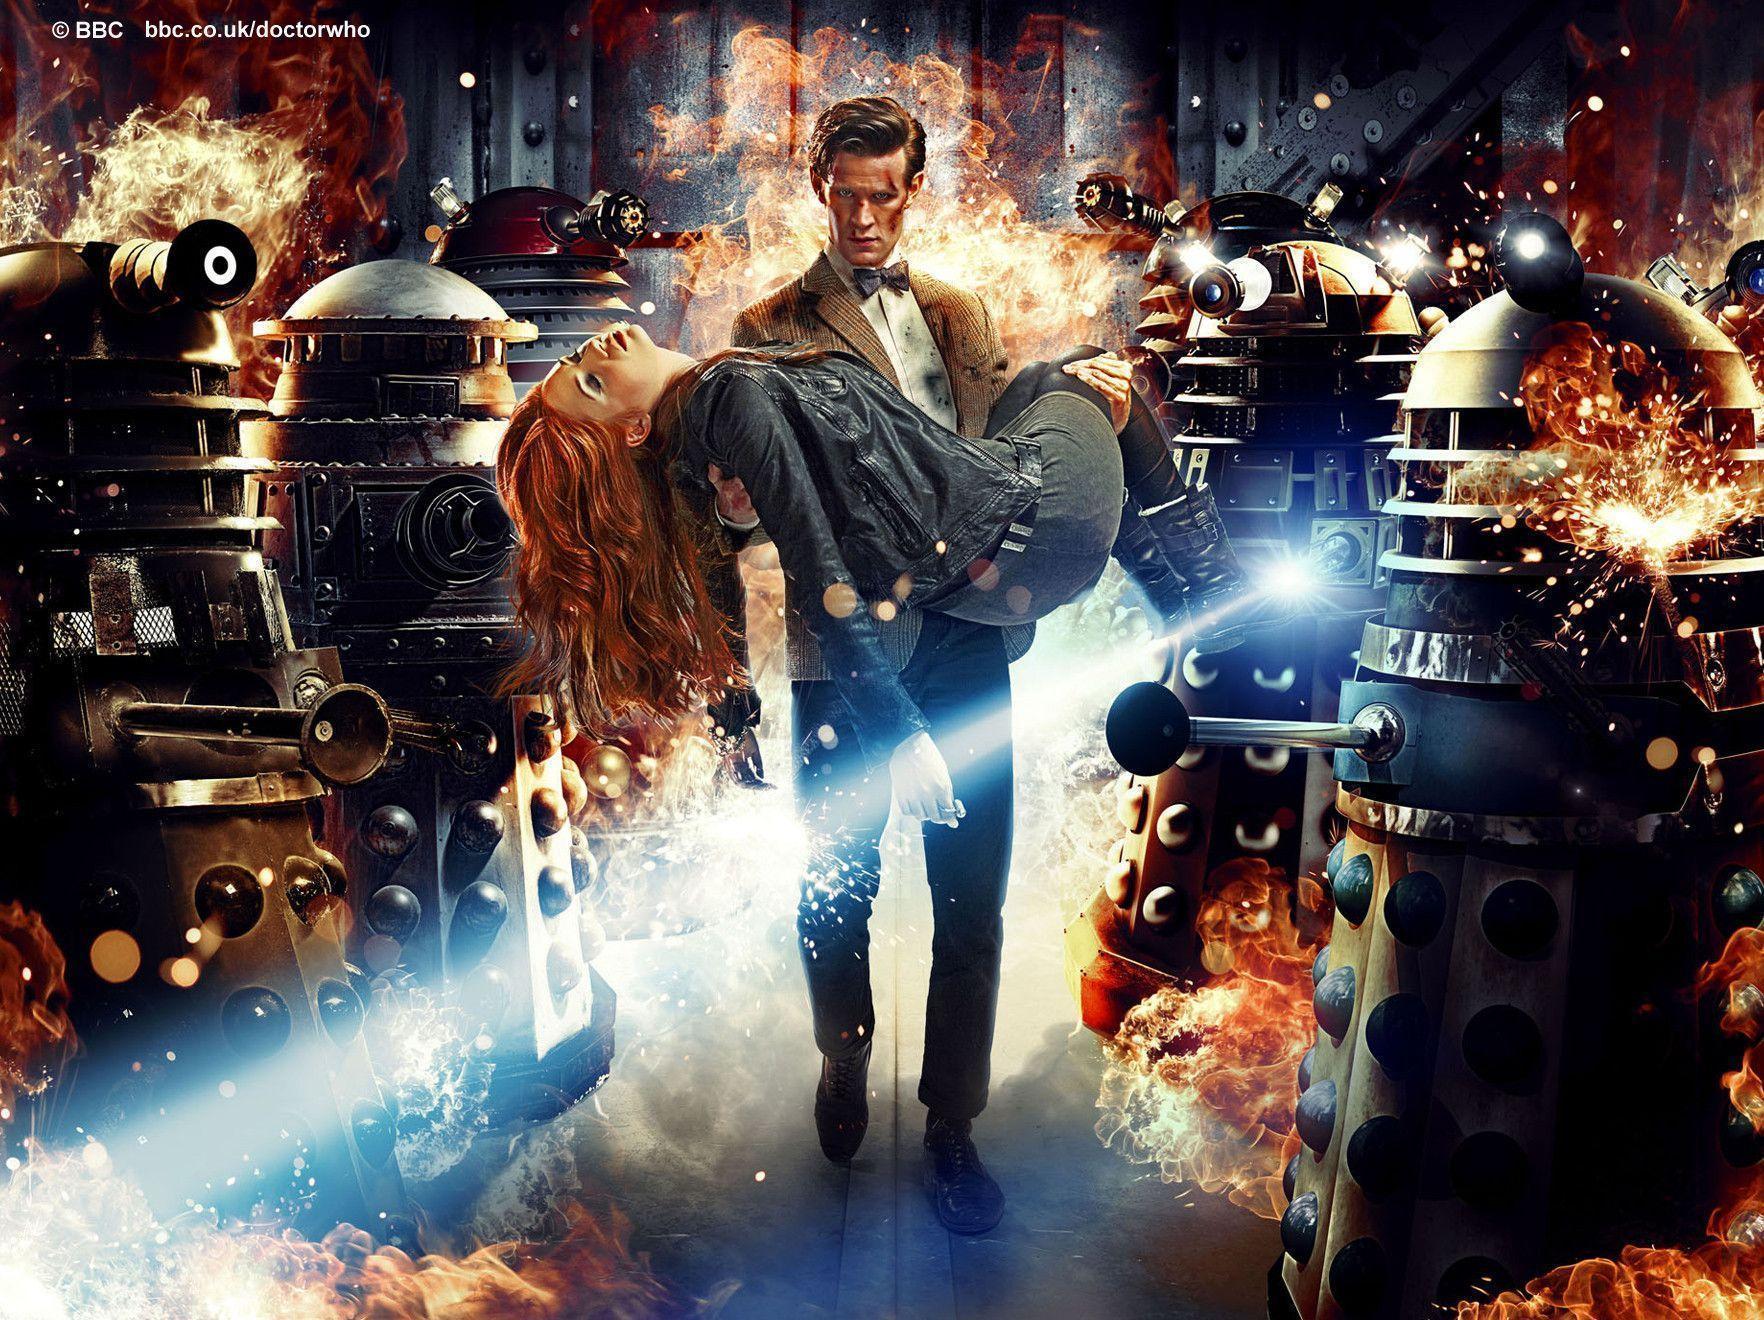 Doctor Who Matt Smith Wallpapers Wallpaper Cave